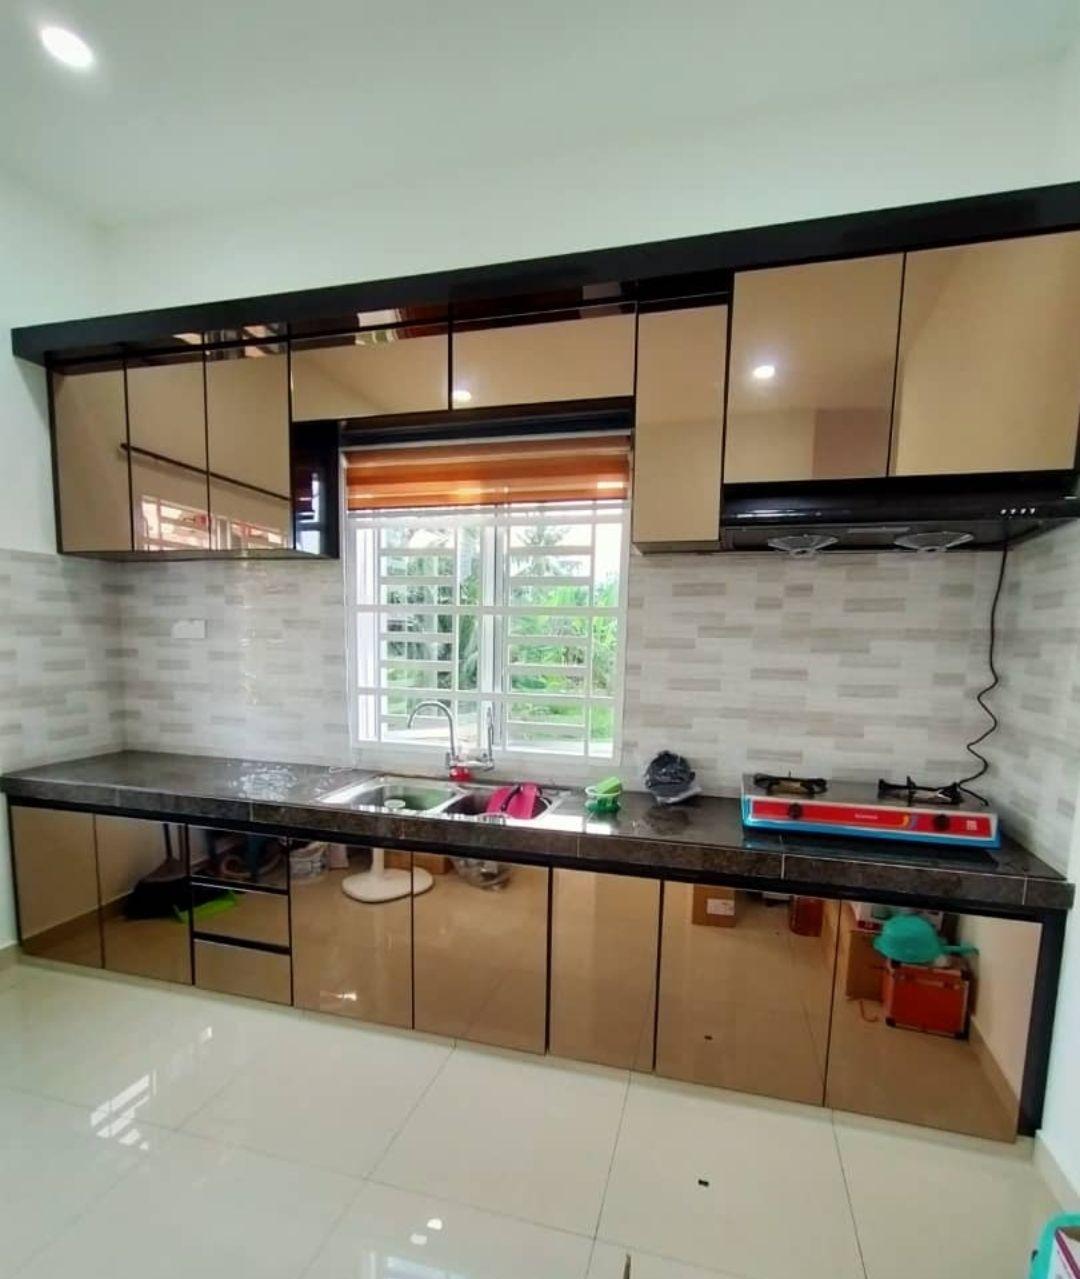 Alhamdulillah Selesai Sudah Pemasangan Kabinet Dapur Di Kg Kandang Melaka Hari Ini Pemasangan Kali Kabinet Dapur Kabinet Dapur